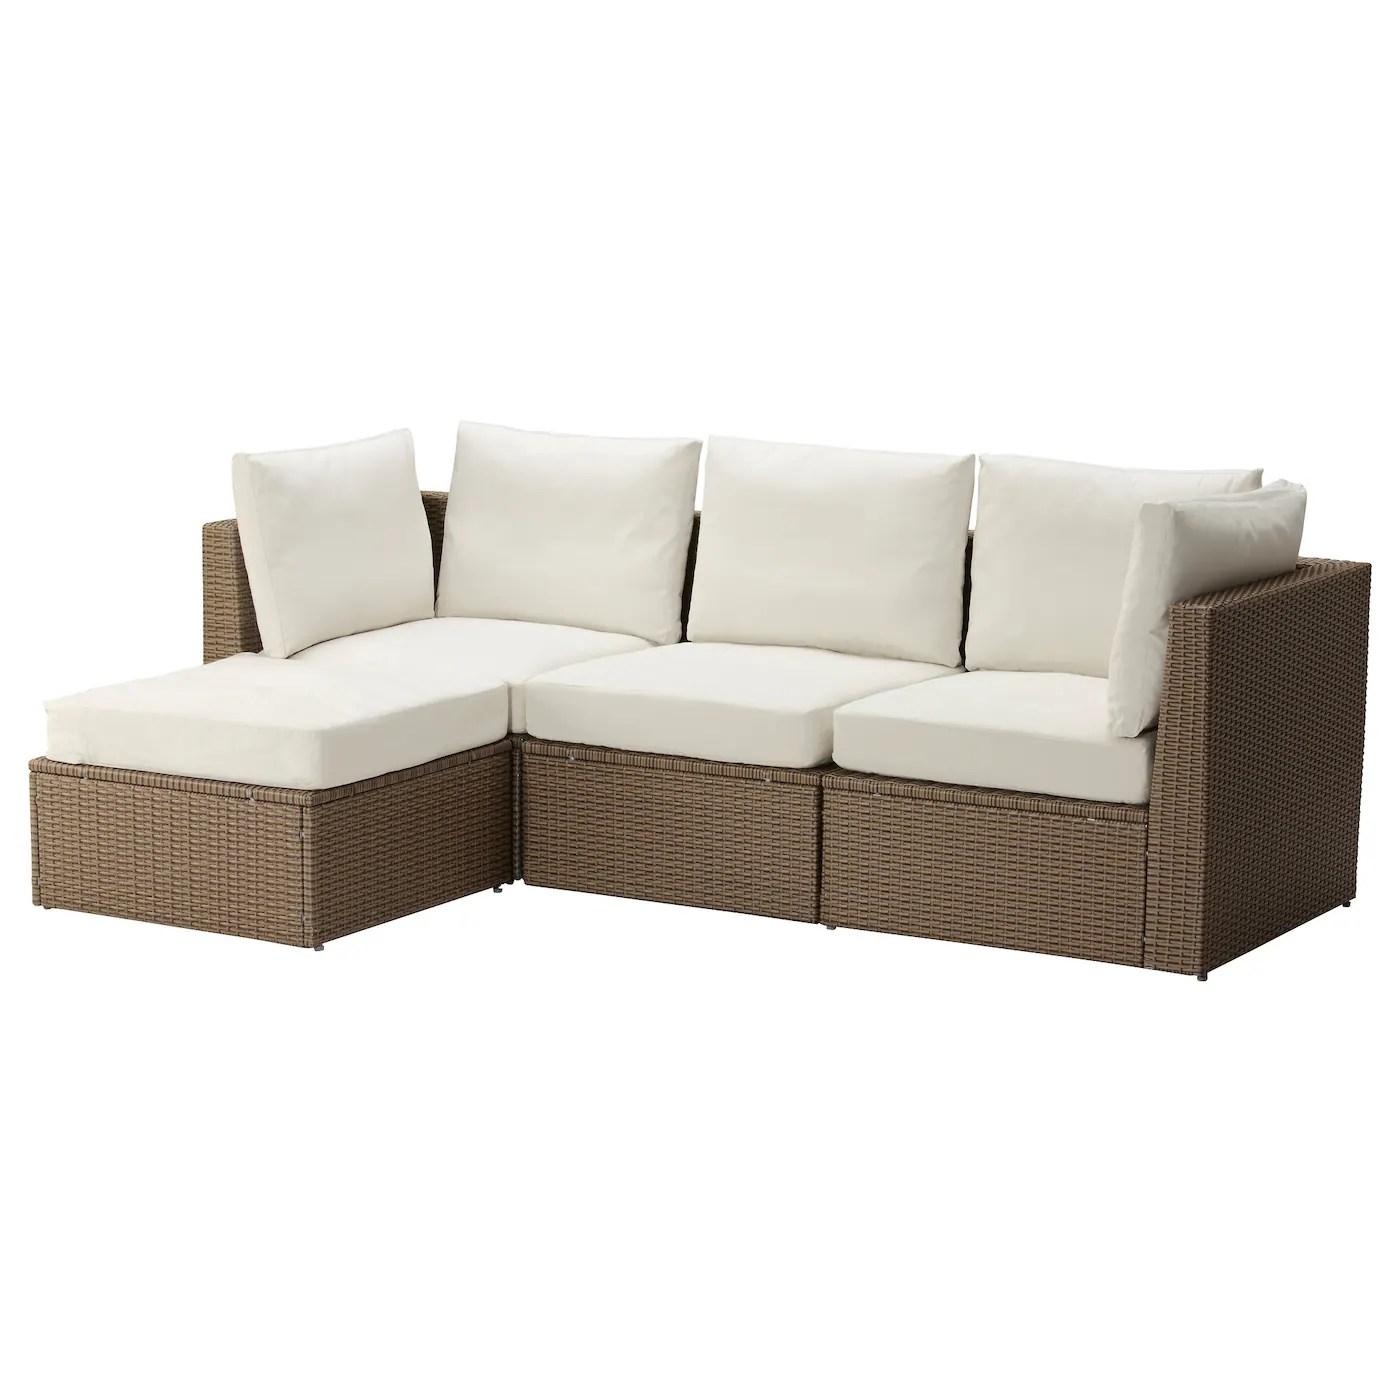 rattan chair ikea staples aero plus ergonomic office outdoor and garden sofas wooden furniture